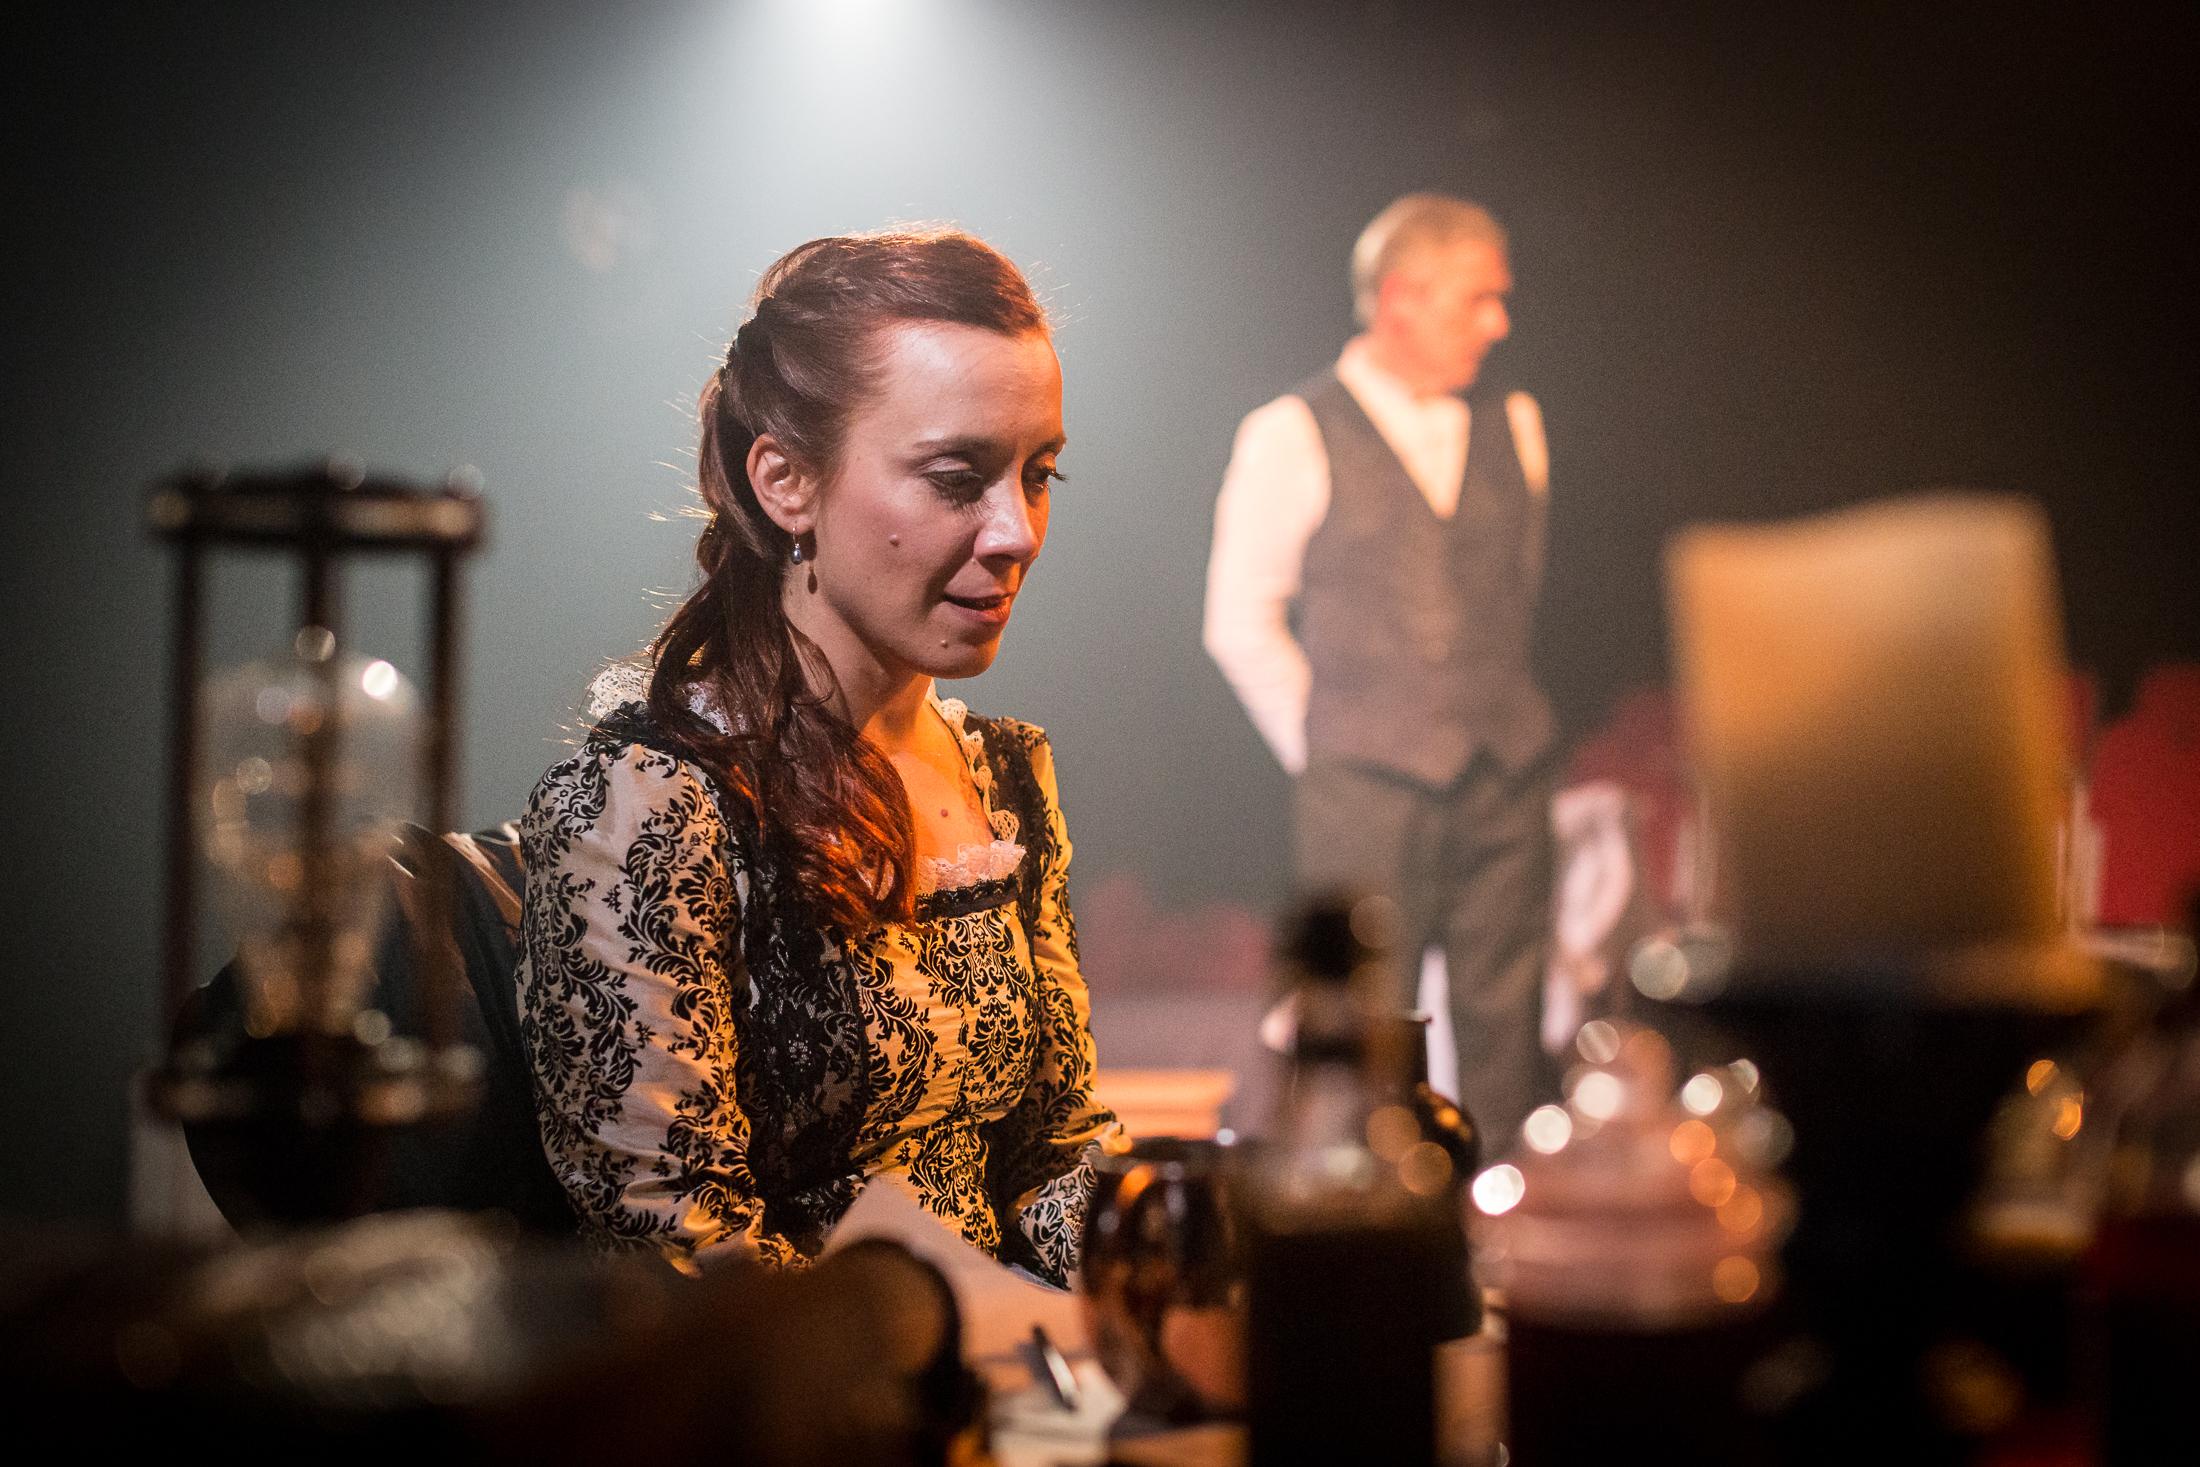 Cornelia Baumann as Mary Shelley